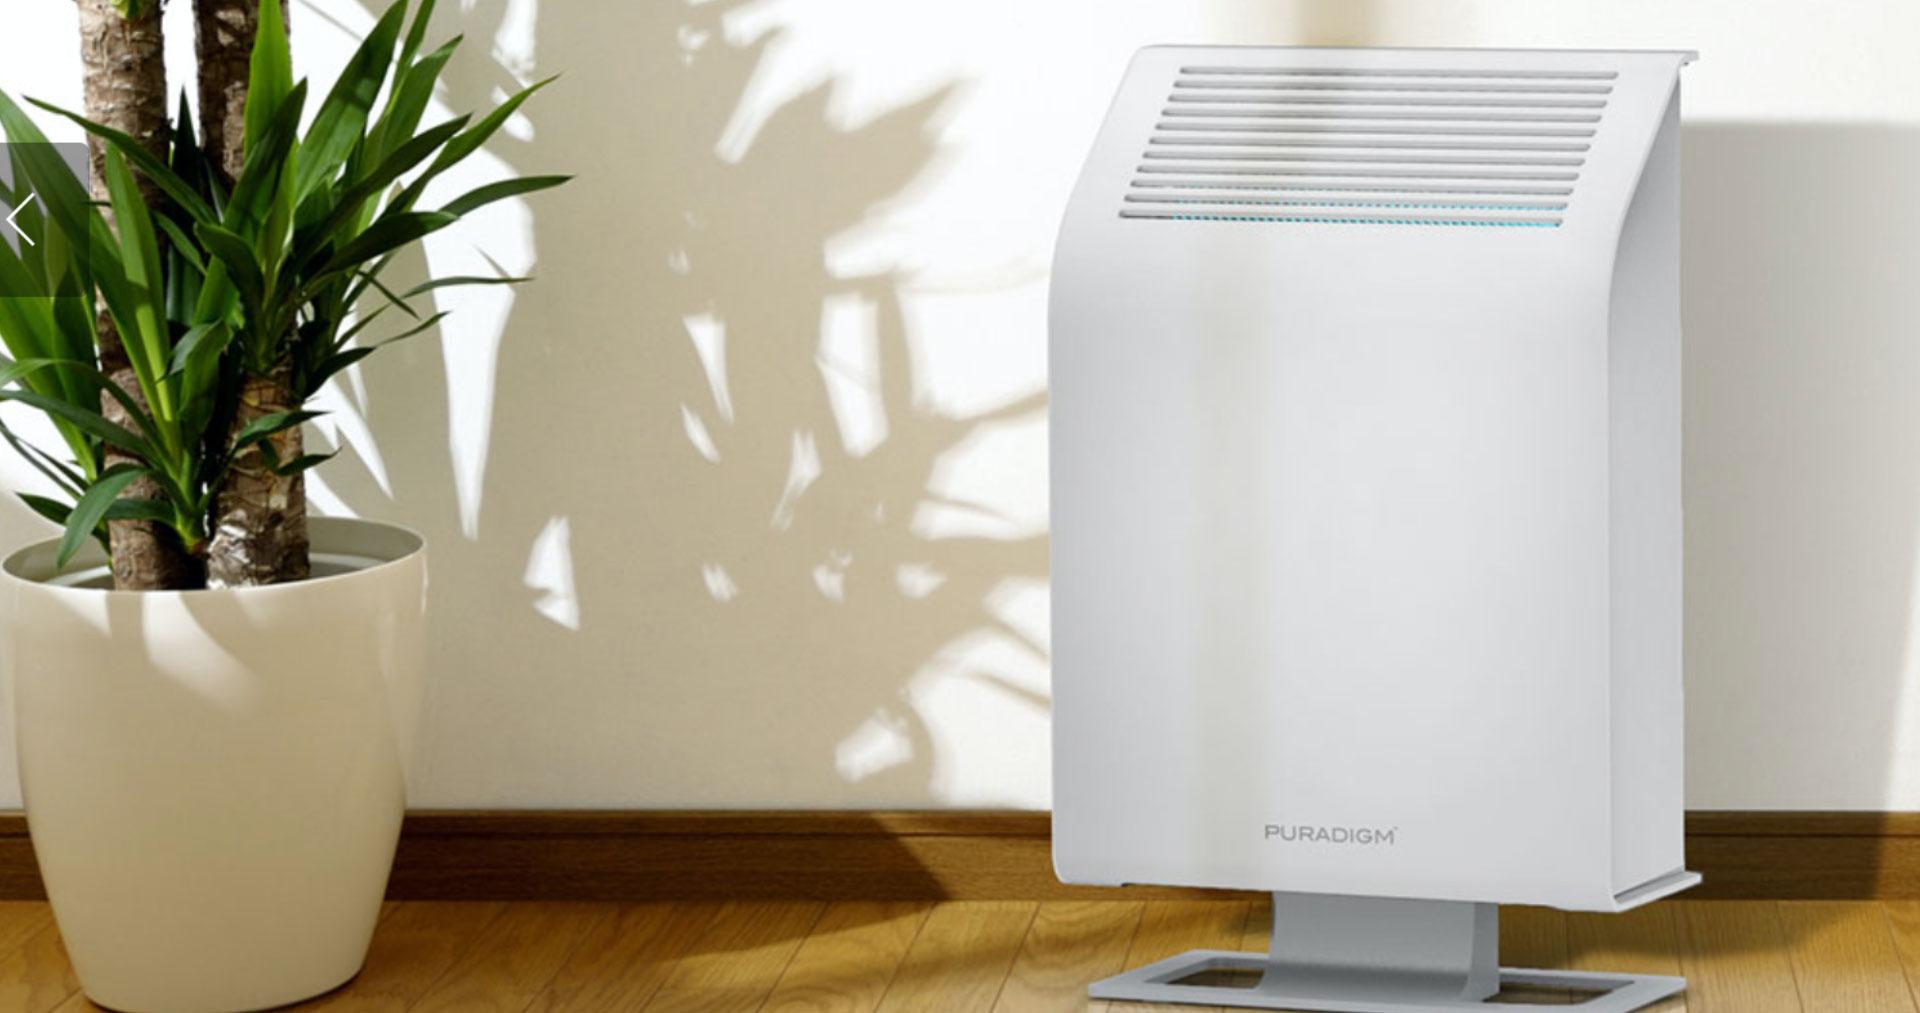 Puradigm Air and Surface Purifier